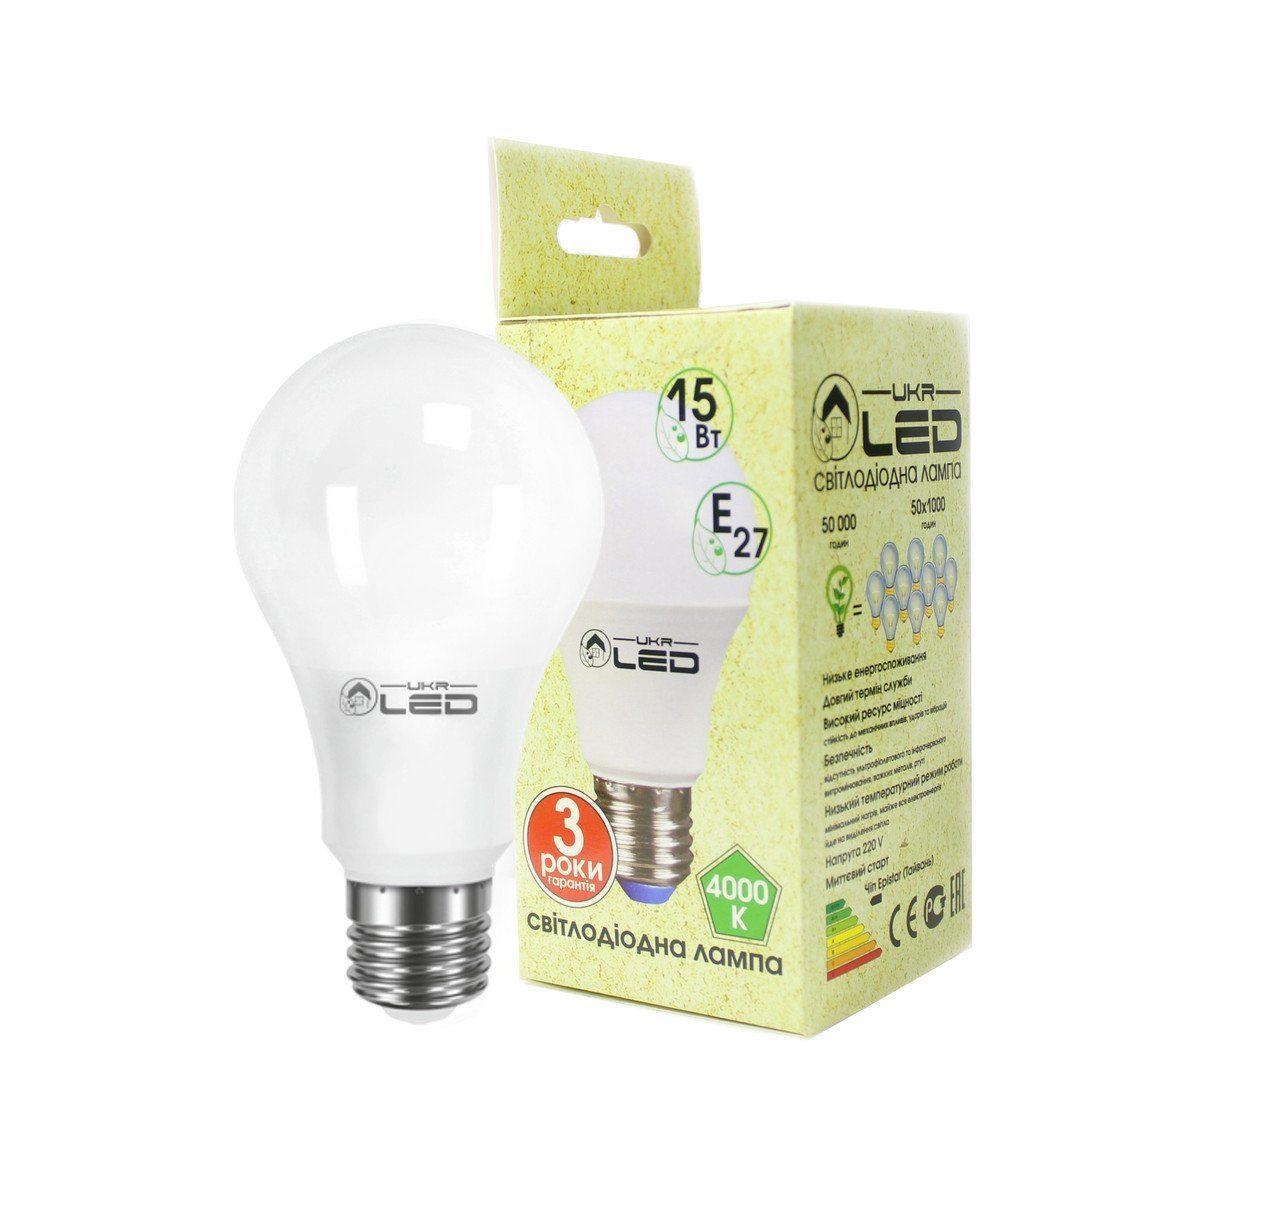 Светодиодная лампа UkrLed Е27 15W (груша) 4000k